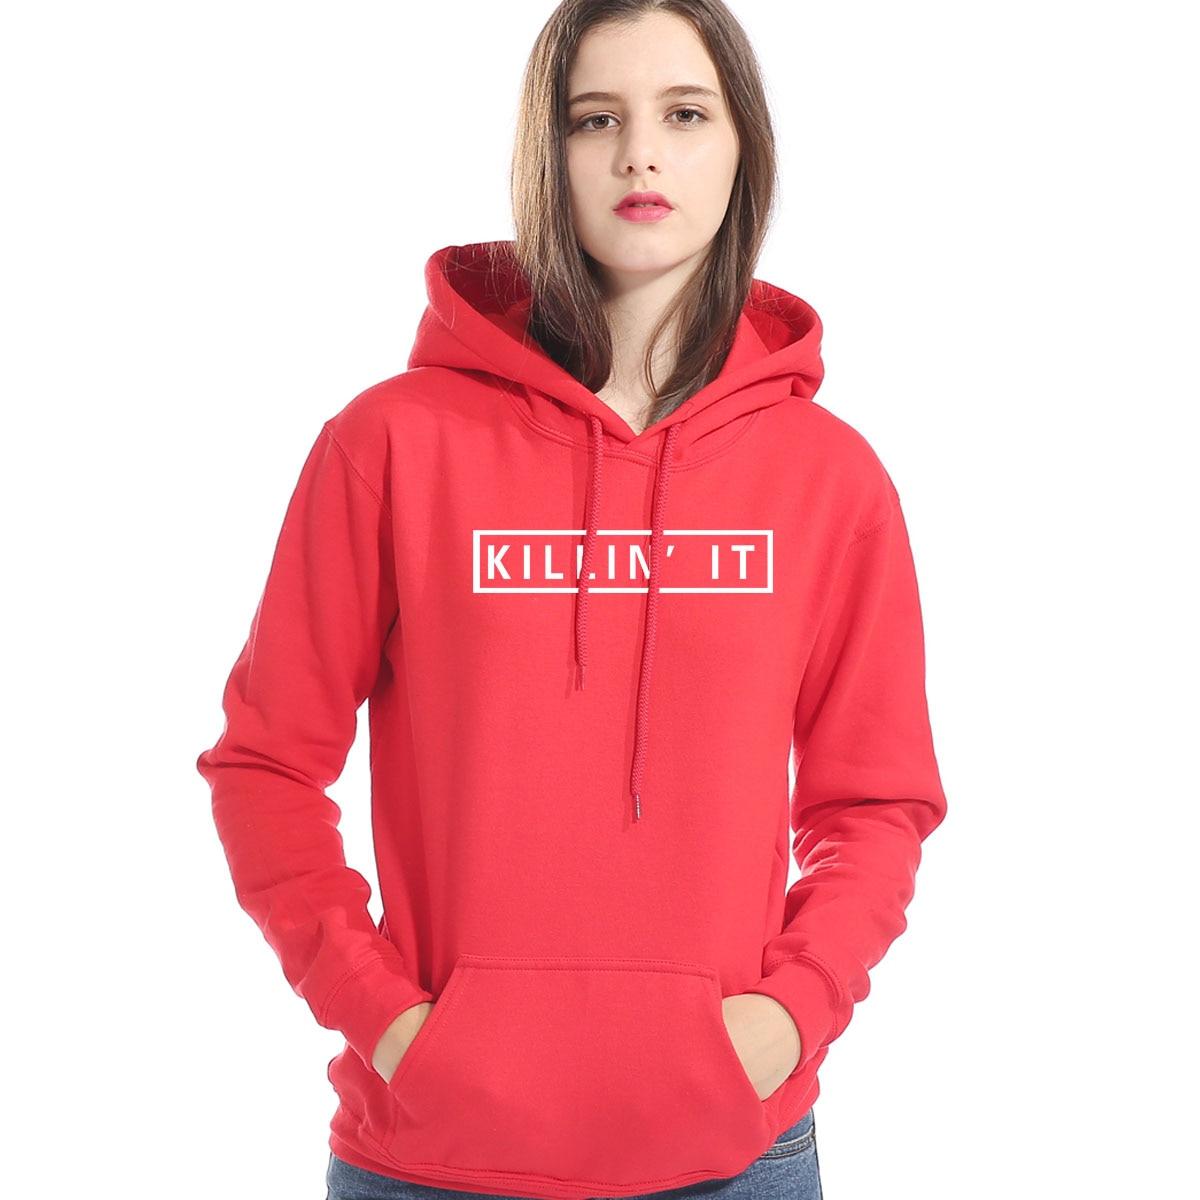 Female Sweatshirt 2019 New Fashion Streetwear Hoody Long Sleeve Fleece Coats Casual Korean Style Women's Hoodies Pullover Tops